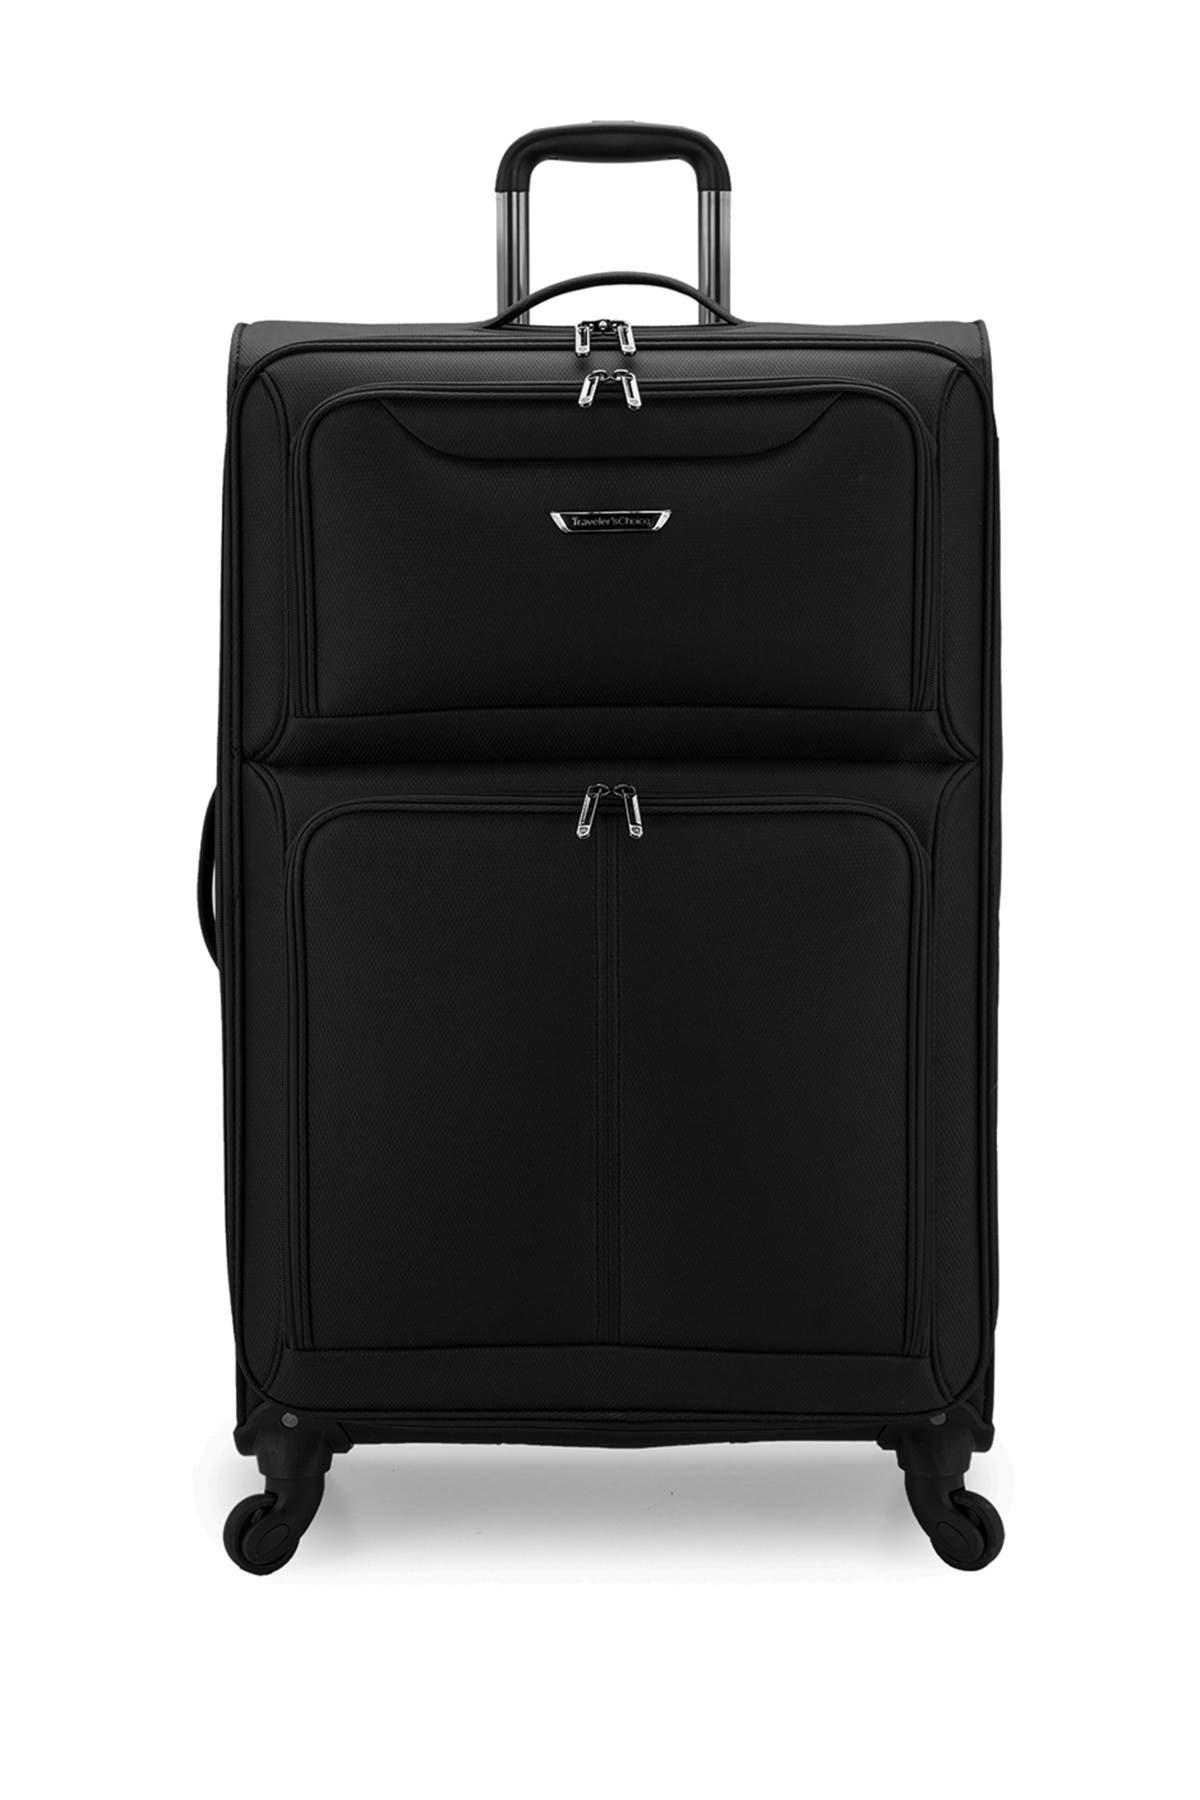 "Image of Traveler's Choice Luggage Cedar 31"" Softside Spinner"